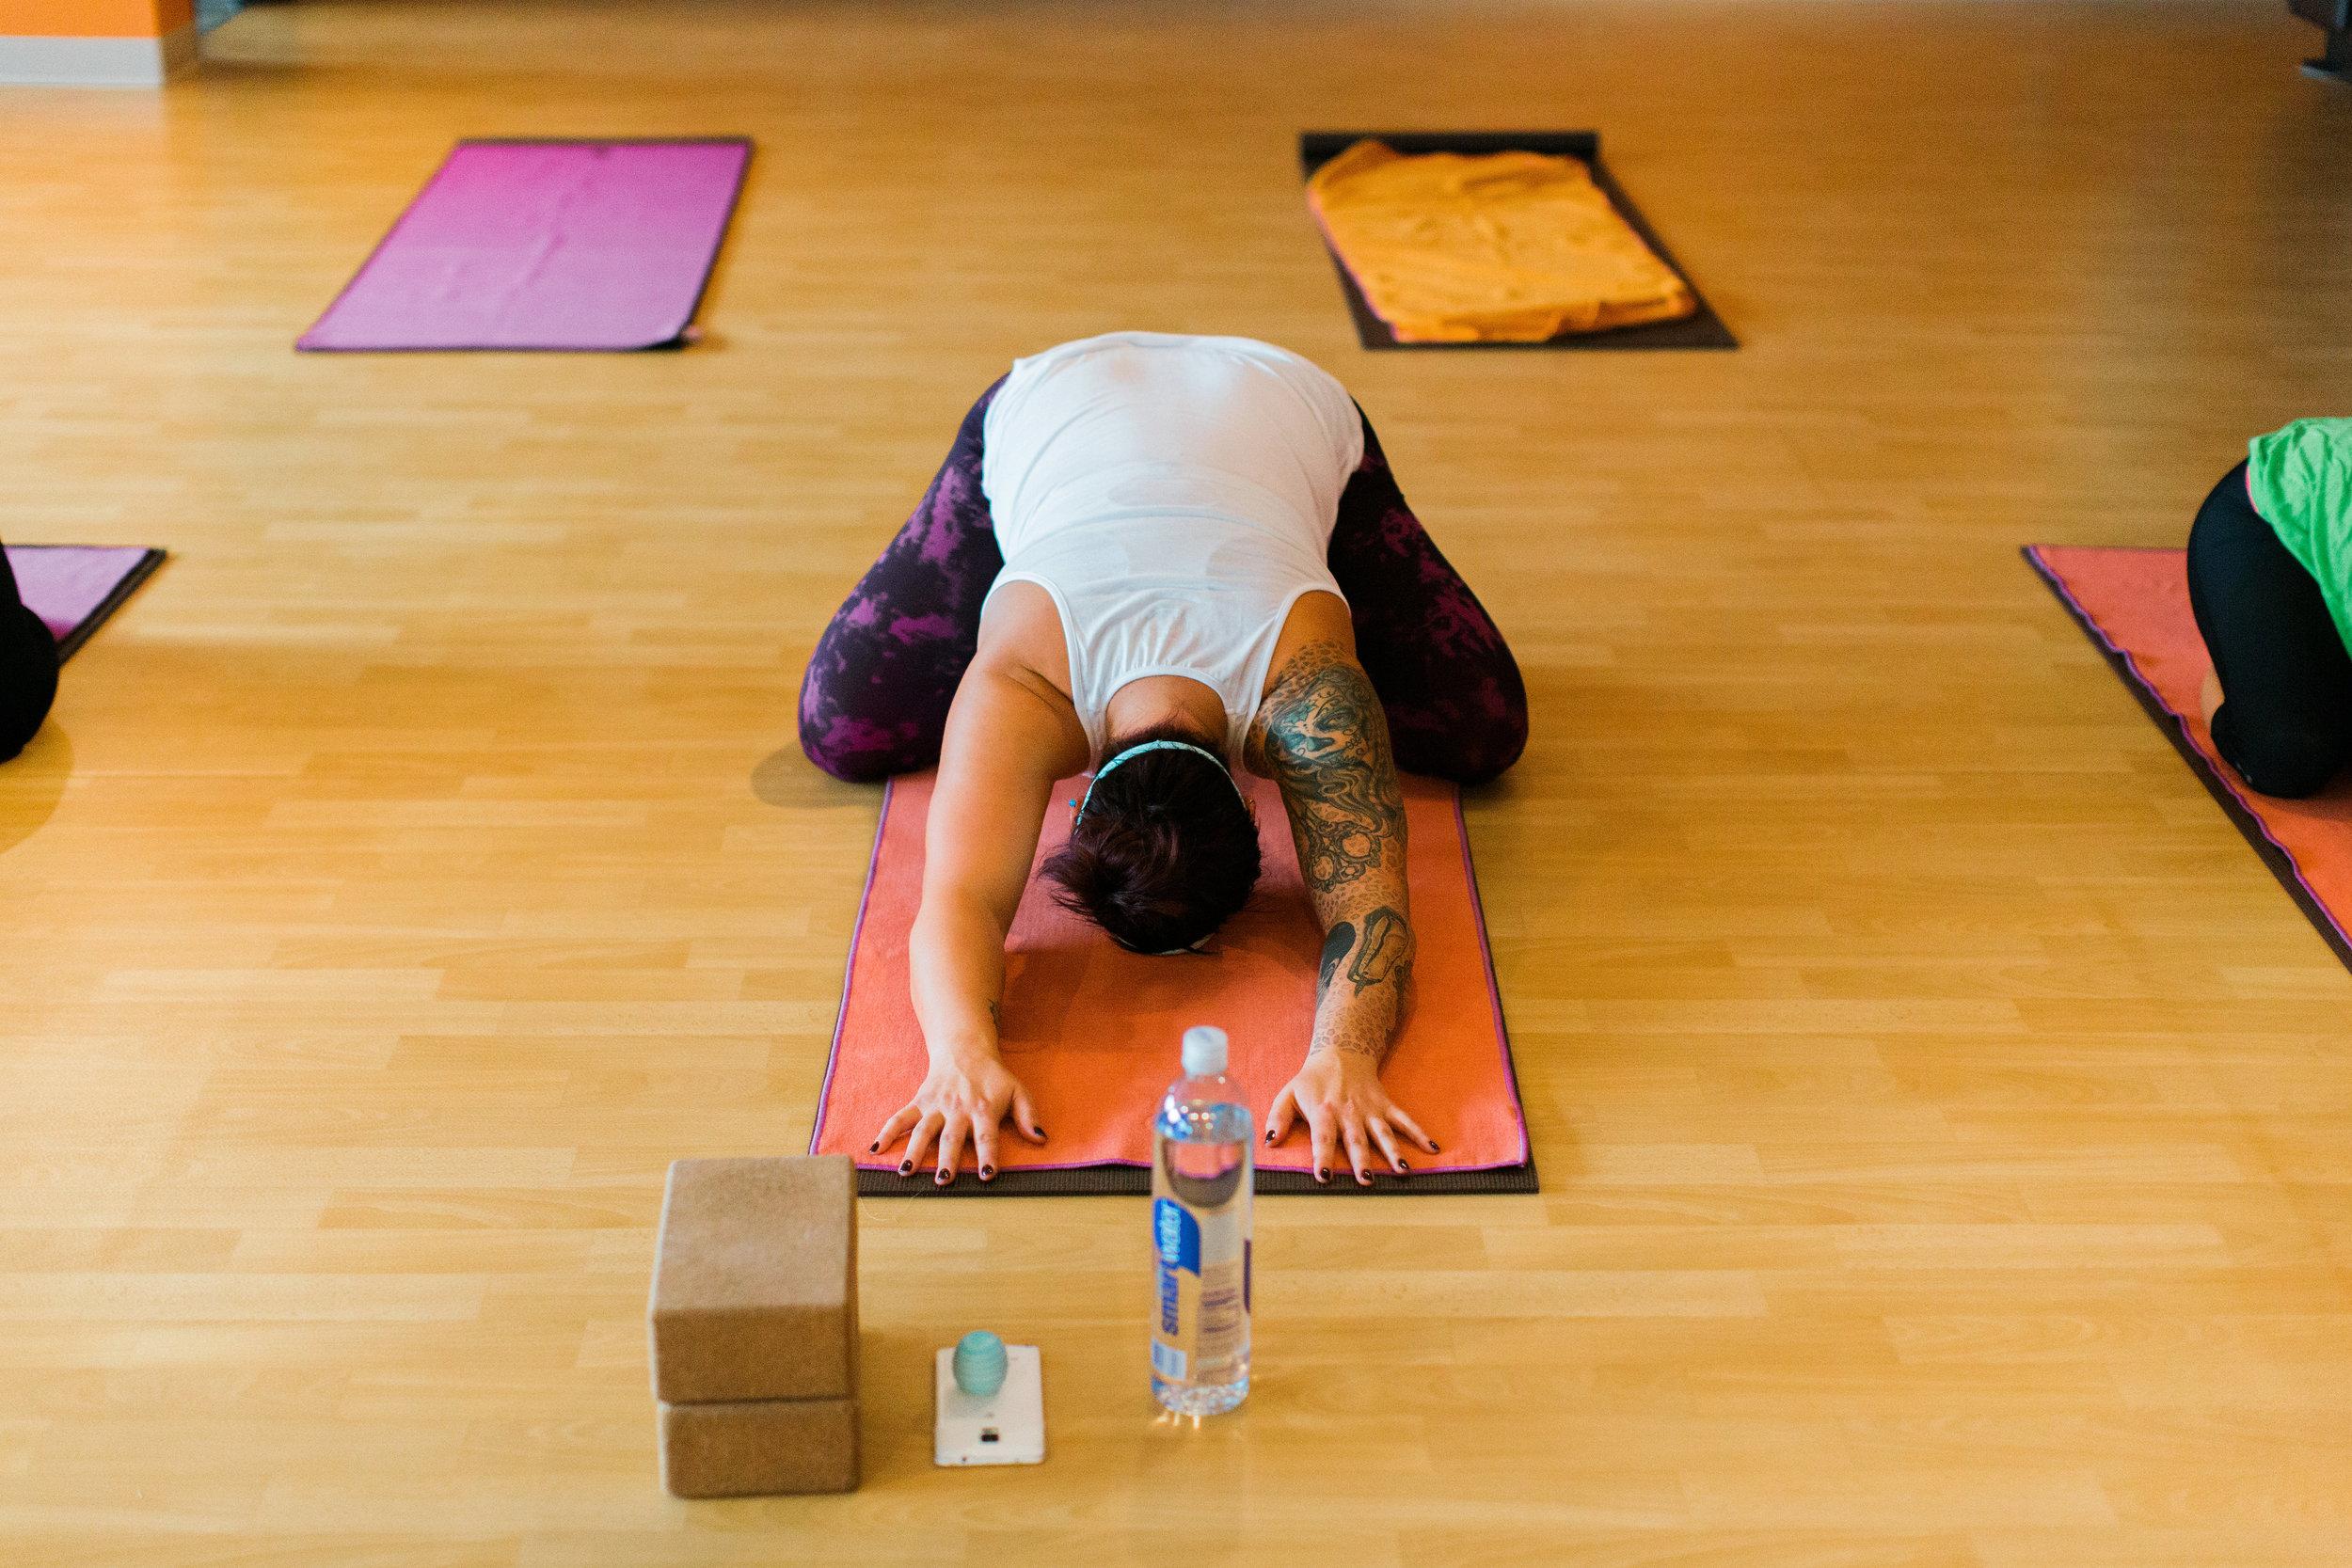 Lauren Bridal Yoga at Hot Asana-Lauren-0006.jpg